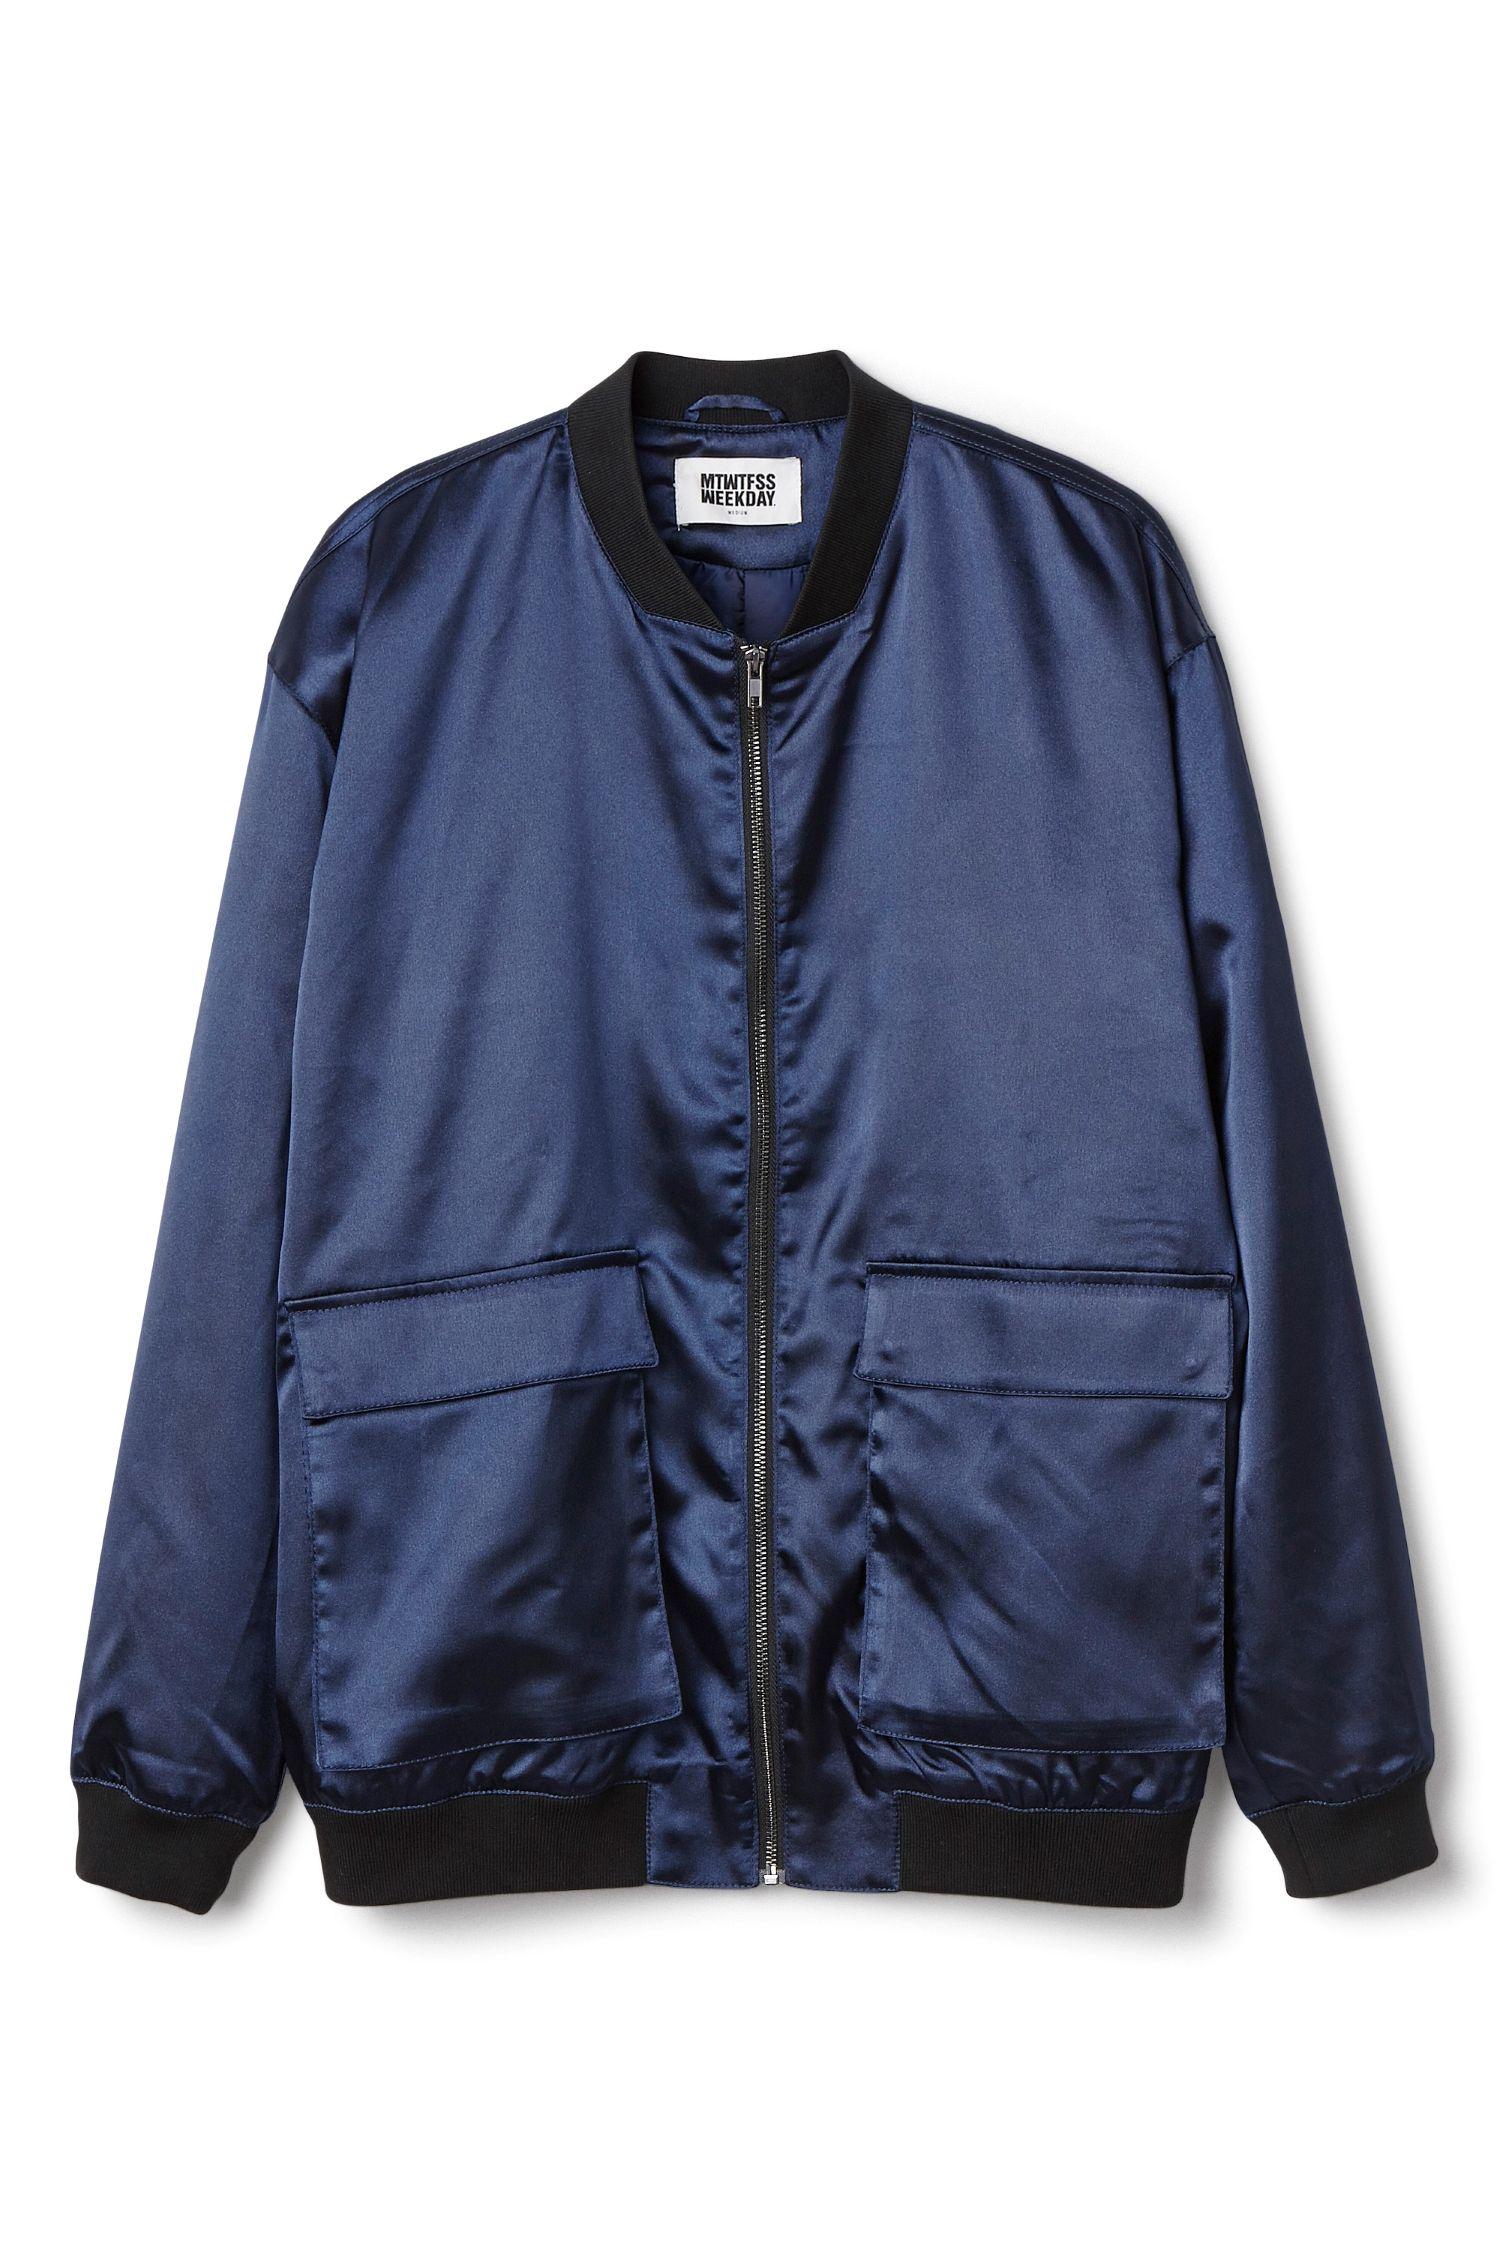 Weekday Sale Pc Big Bomber Jacket Bomber Jacket Jackets Street Fashion Brands [ 2250 x 1500 Pixel ]